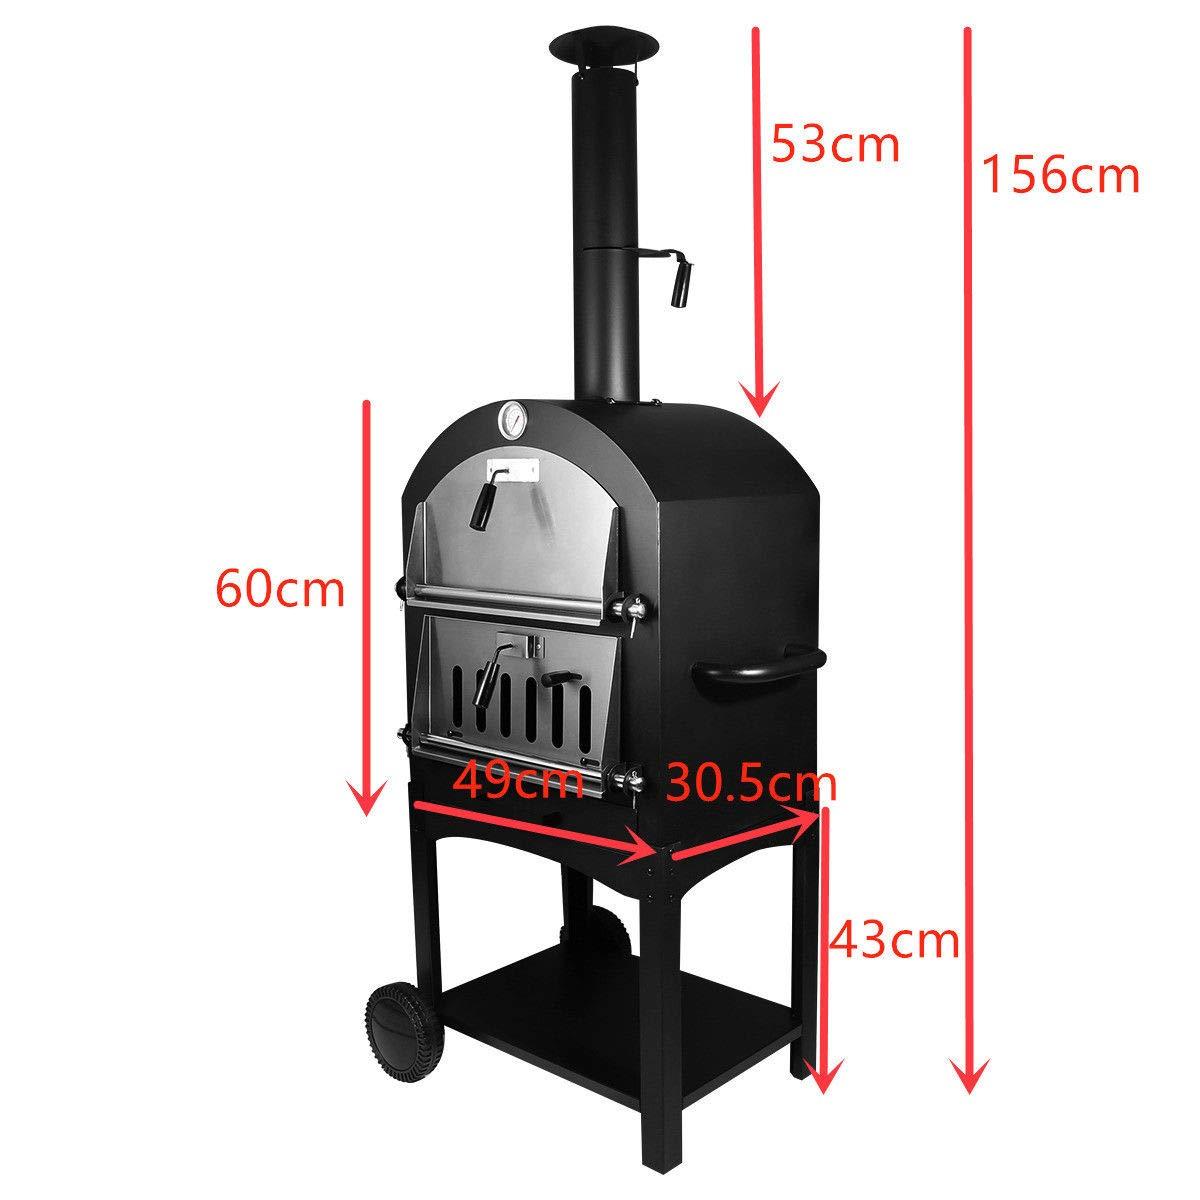 Amazon.com: Lapha - Parrilla para horno de pizza de madera ...